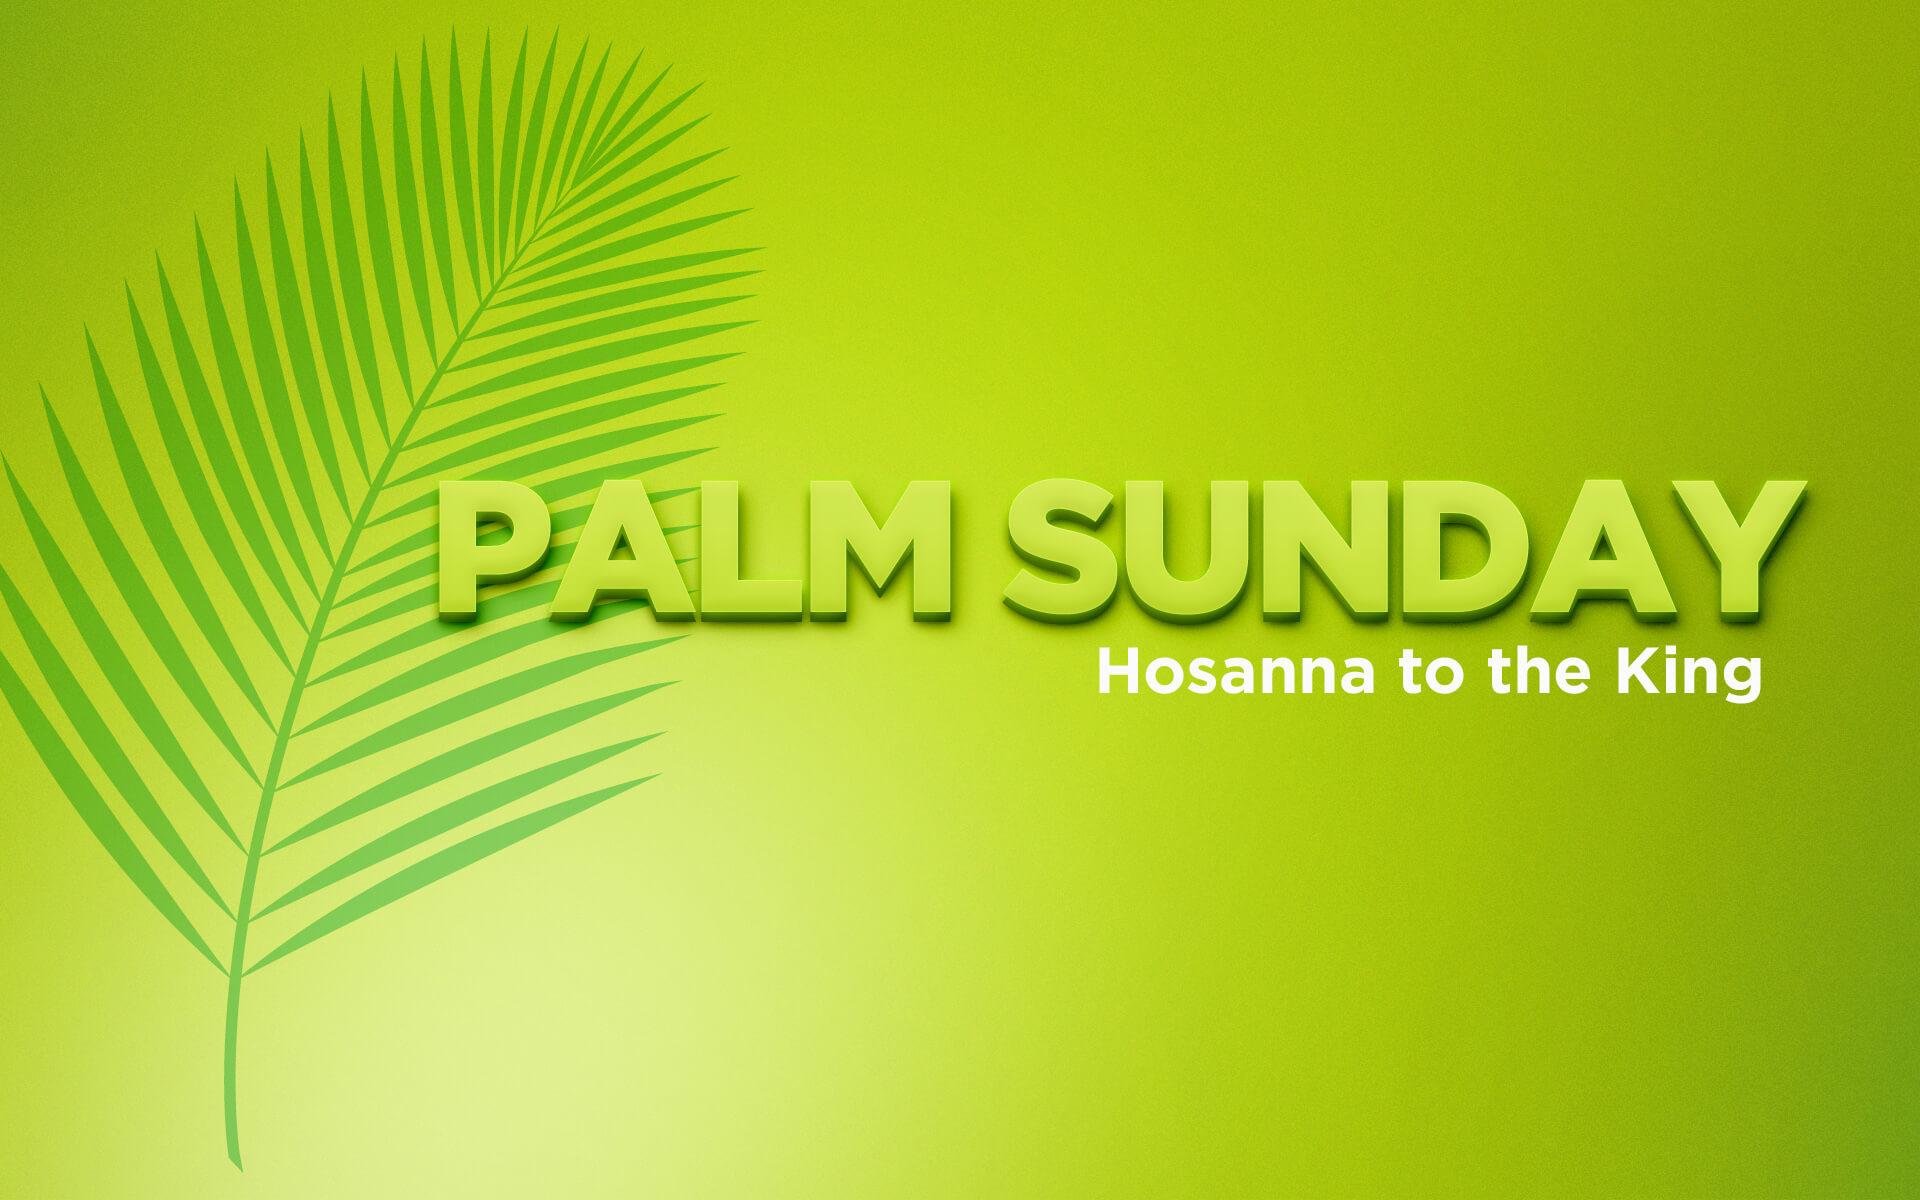 Palm Sunday Hosanna King Jesus Hd Wallpaper